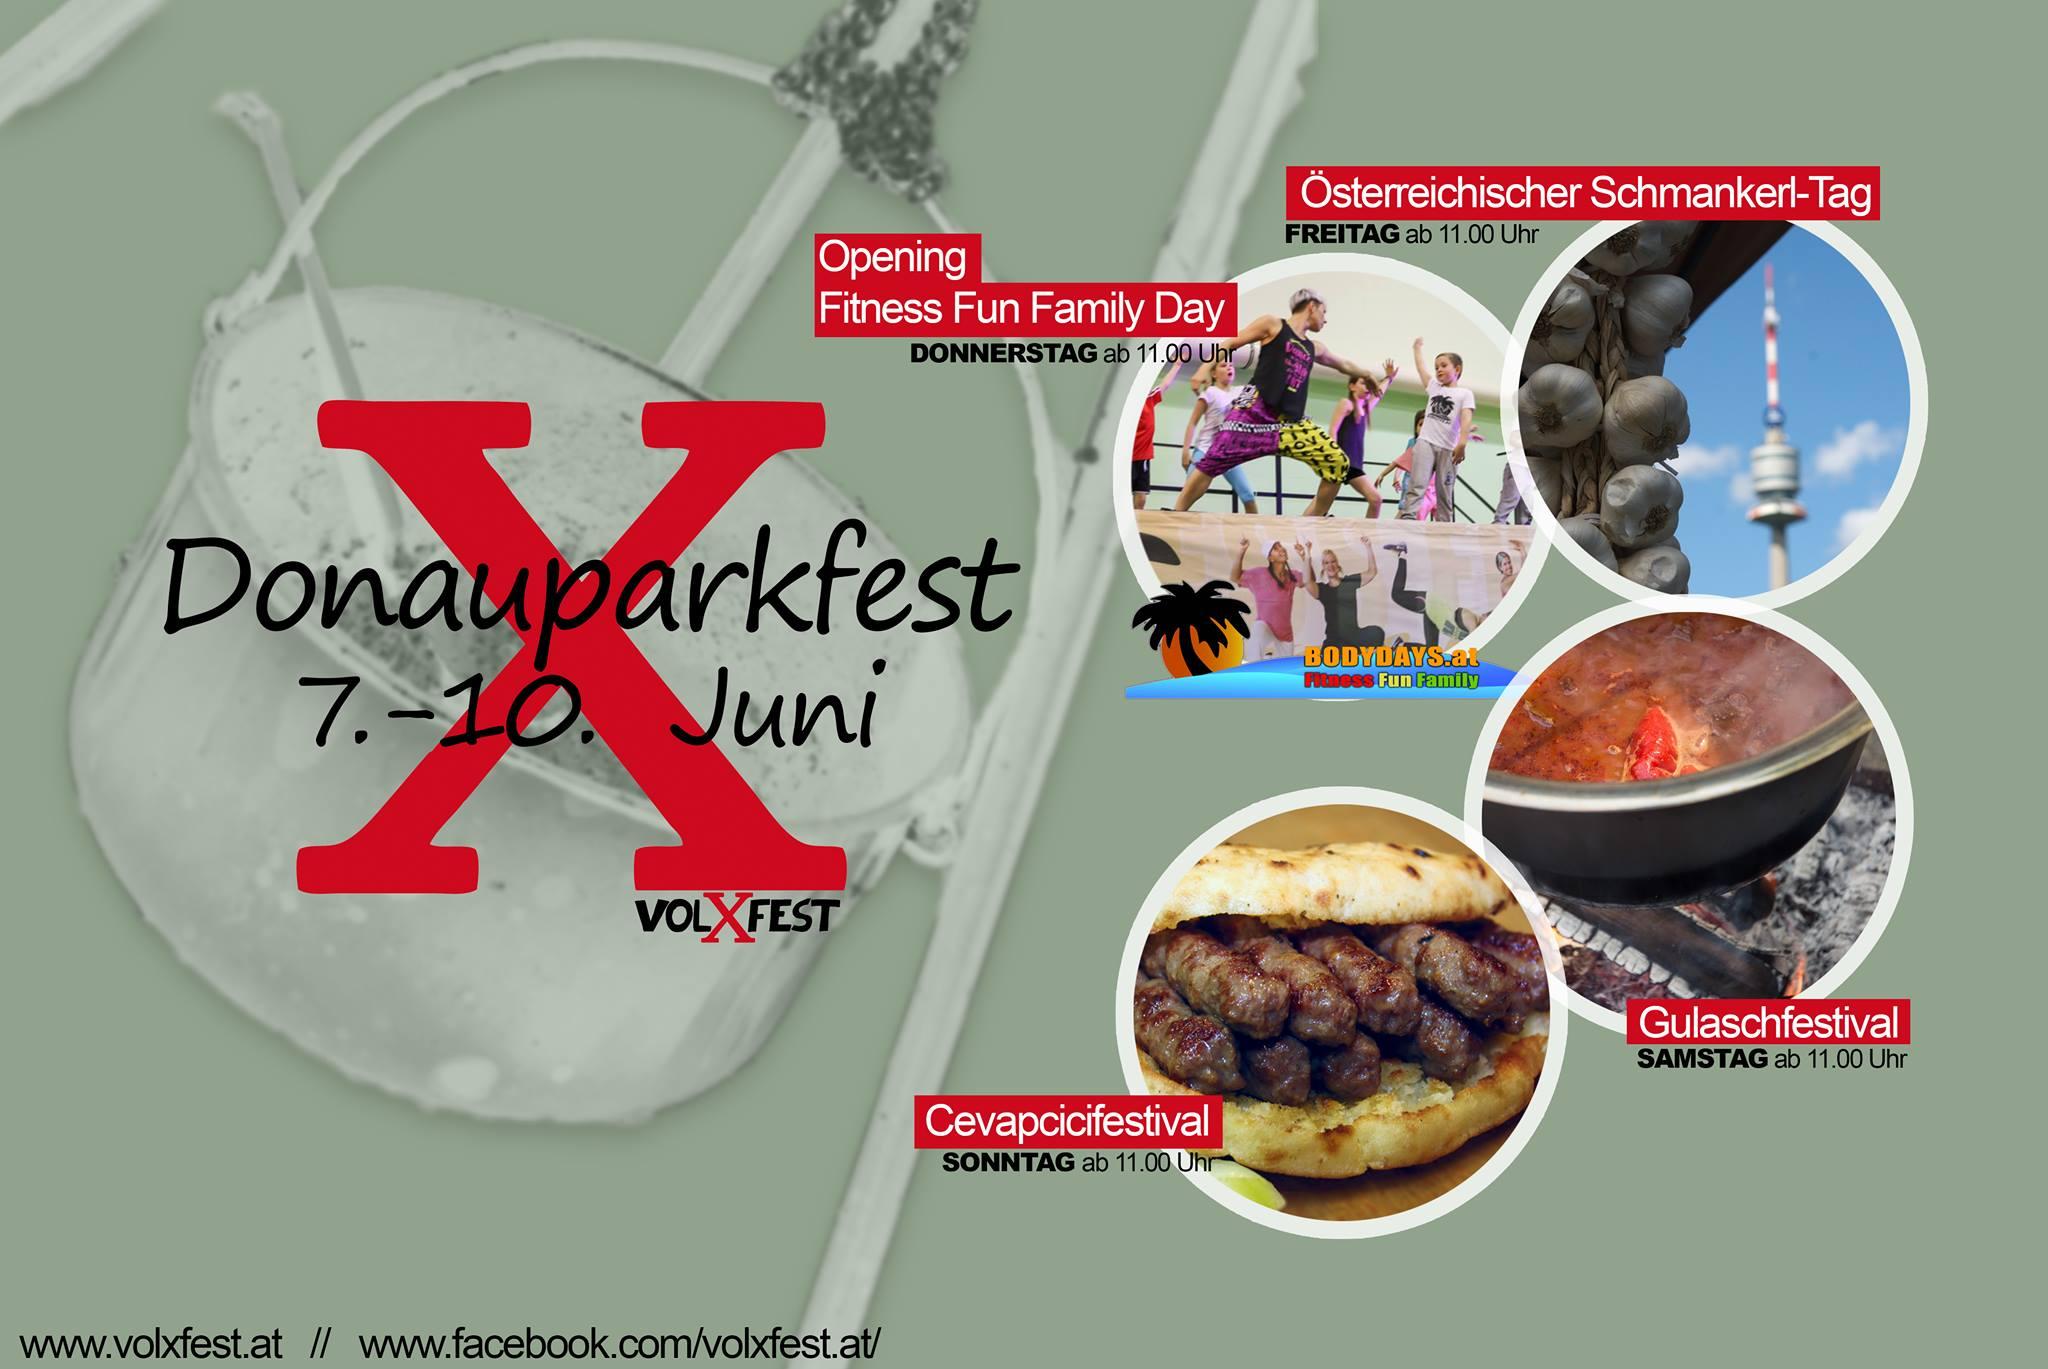 Donauparkfest 2018